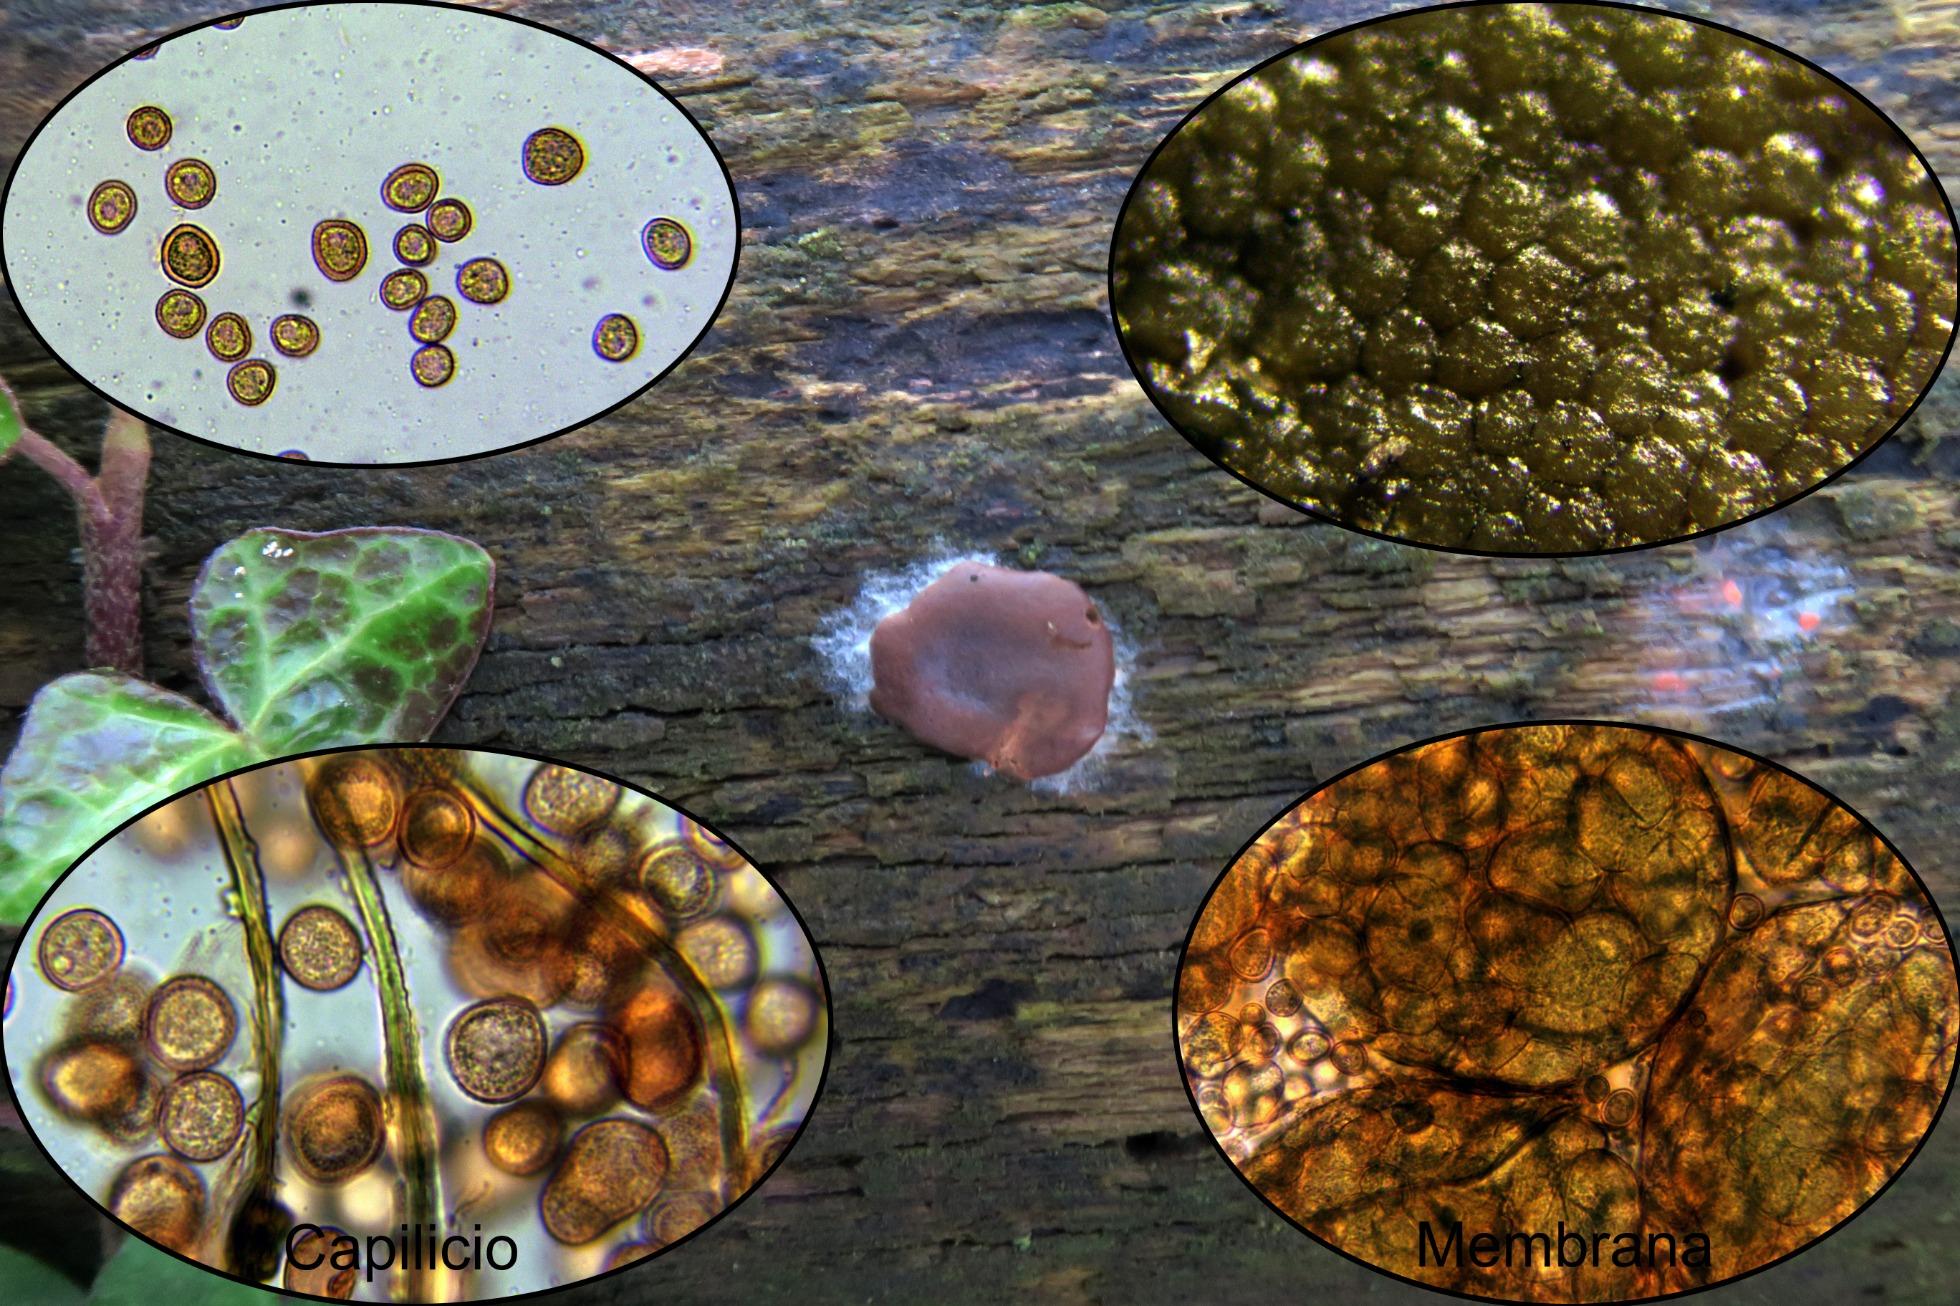 Dictydiaethaliumplumbeum_2020-07-12.jpg